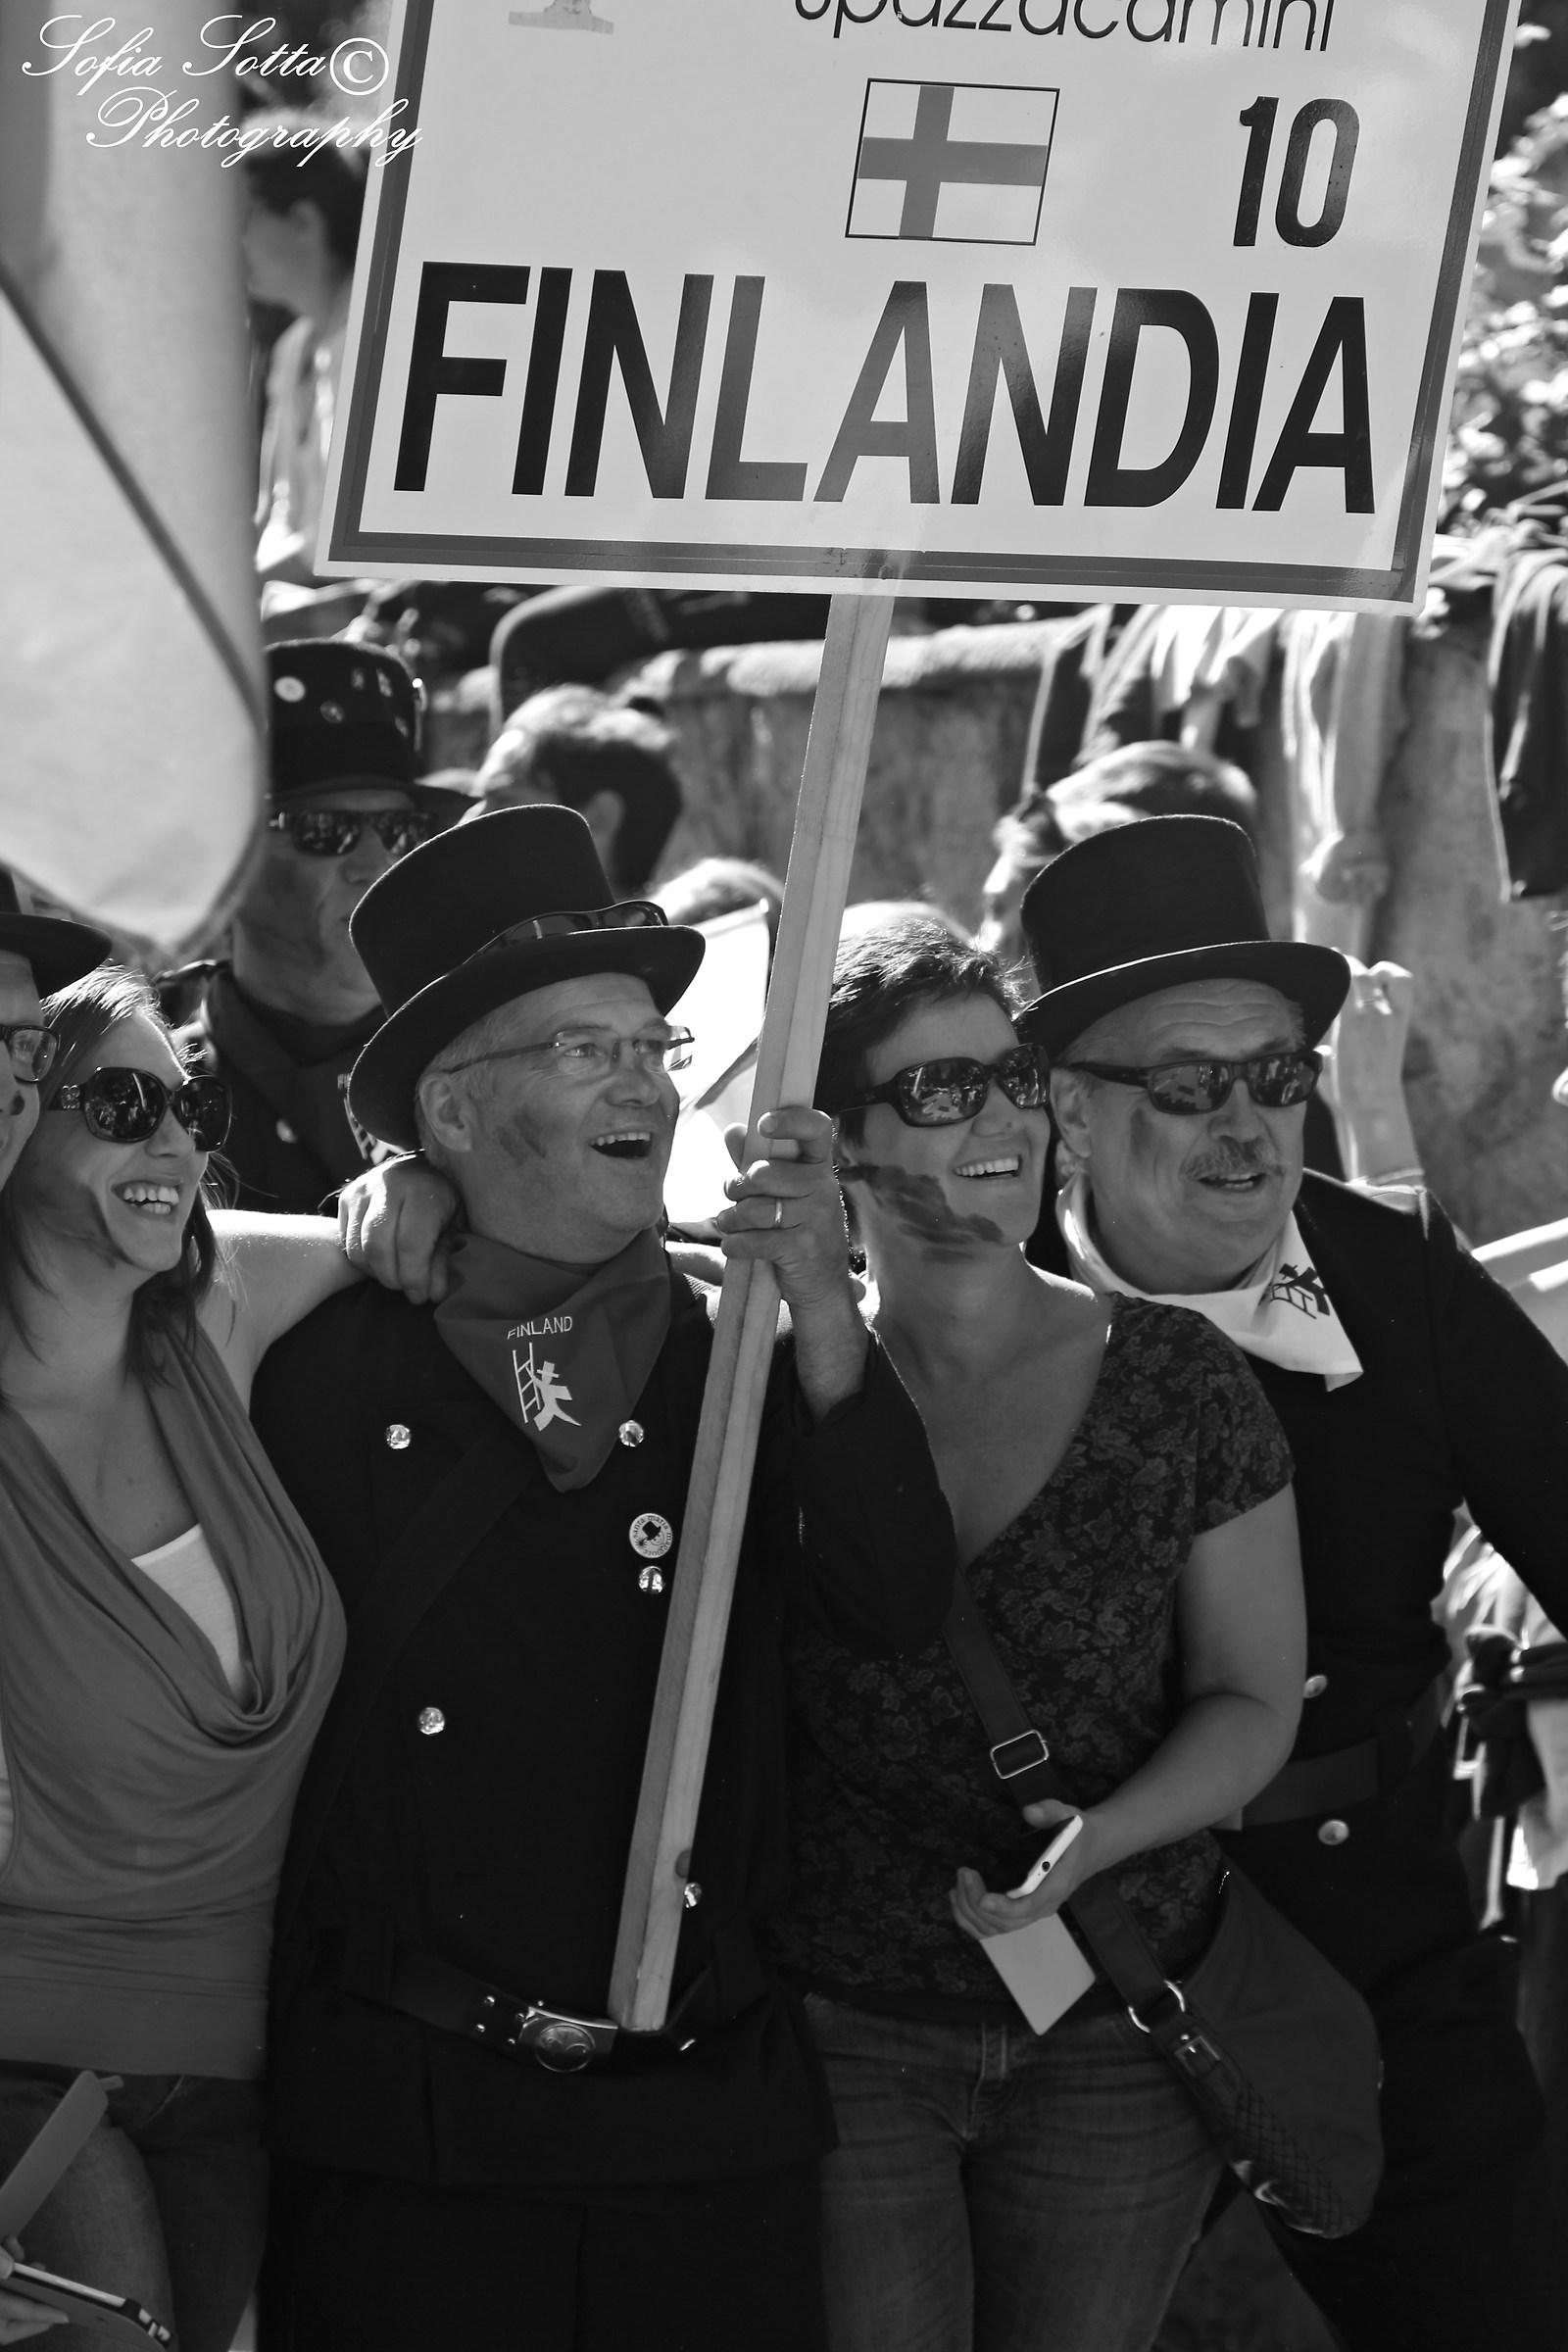 Finlandia...